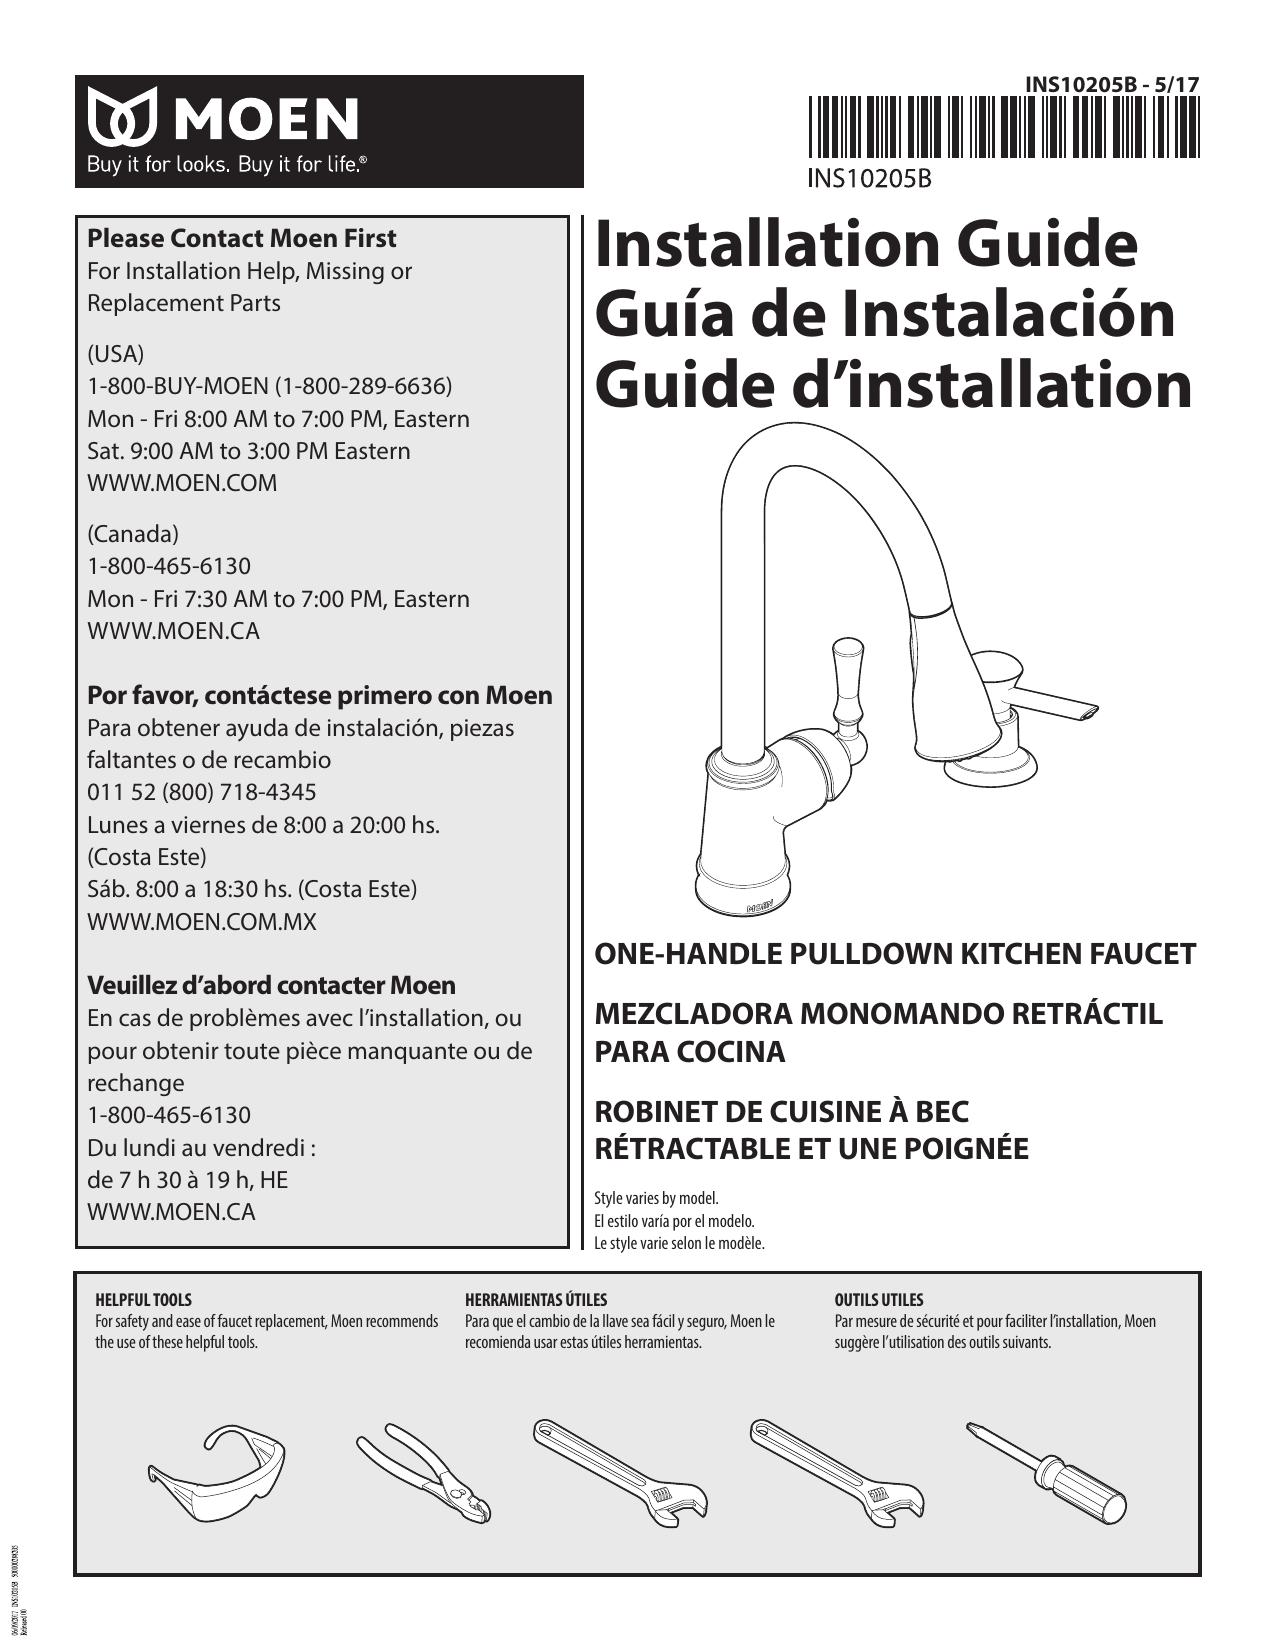 Installation Guide Guia De Instalacion Guide D Installation Manualzz